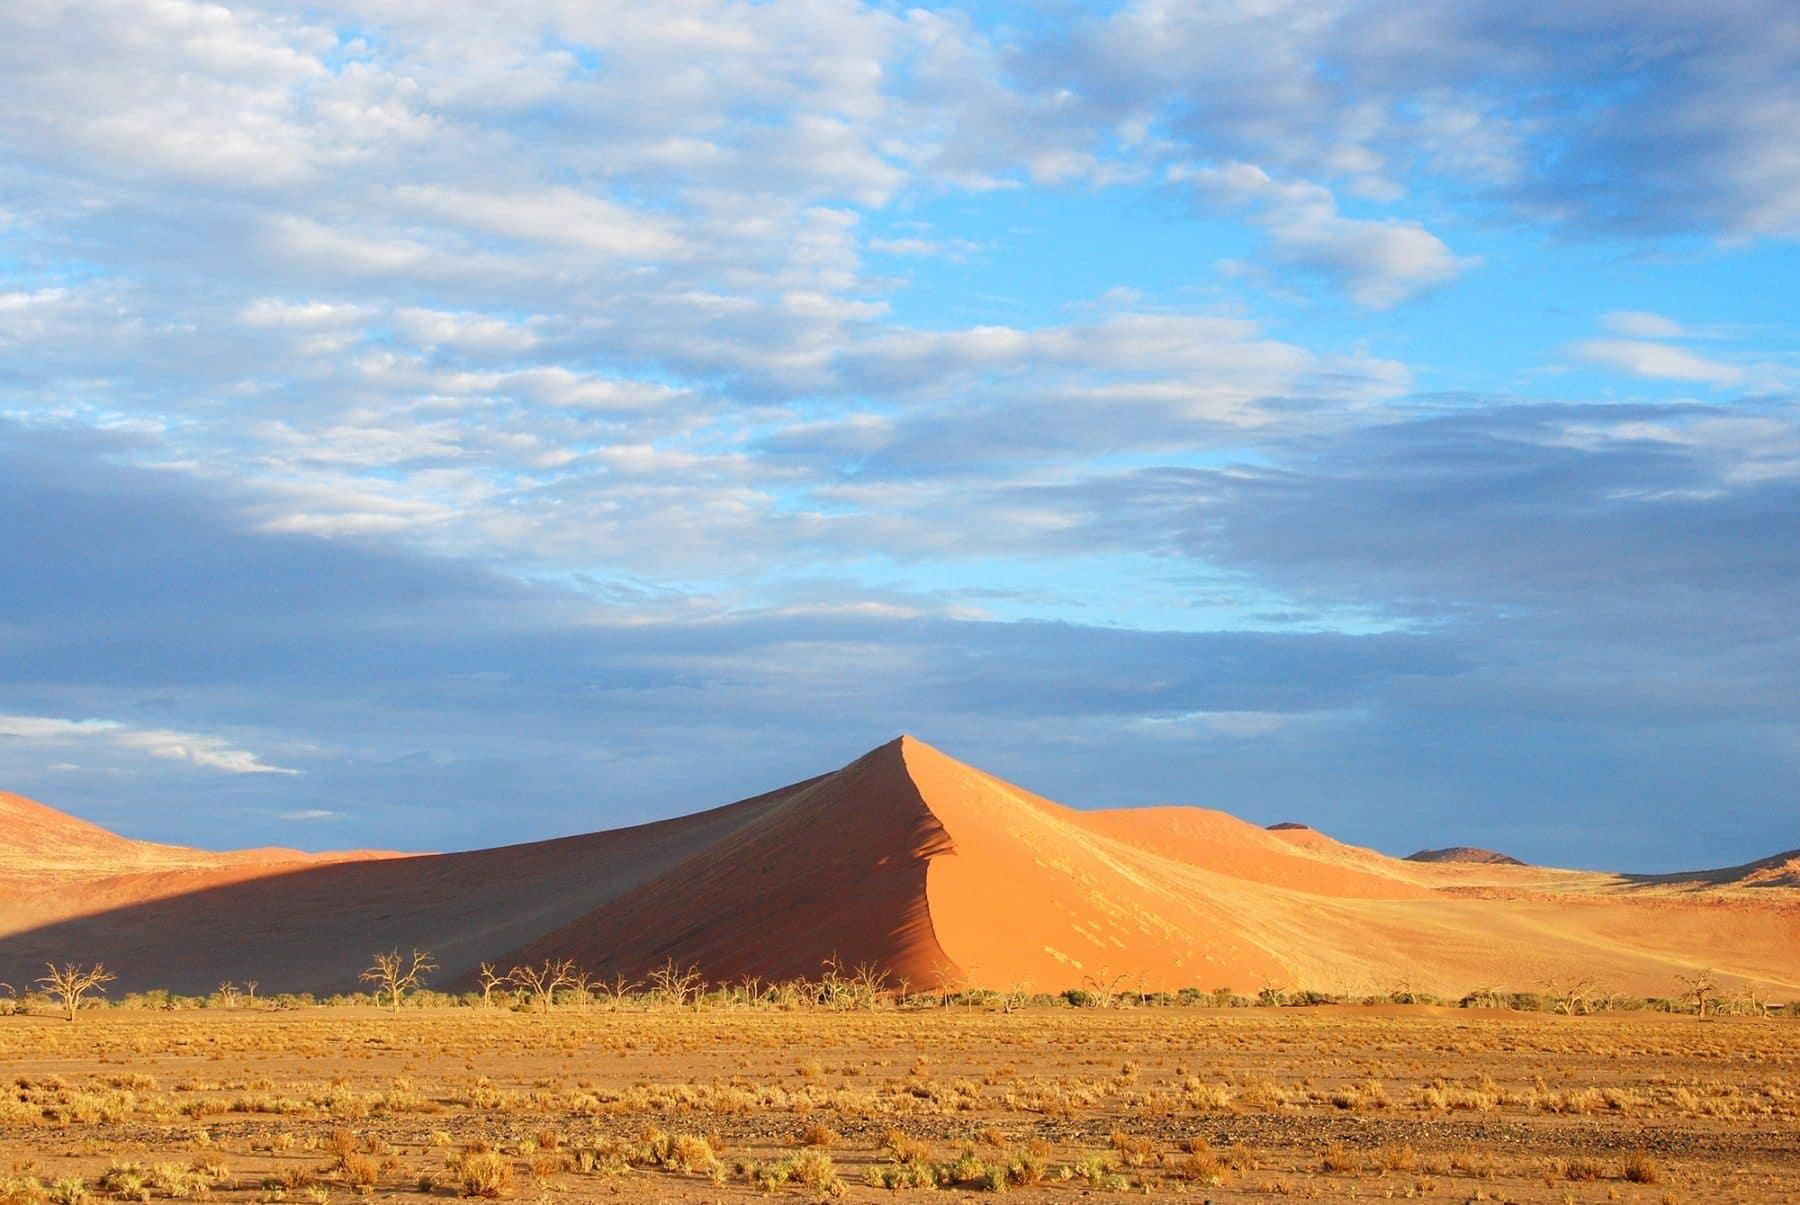 Viaje al desierto del Namib Namibia